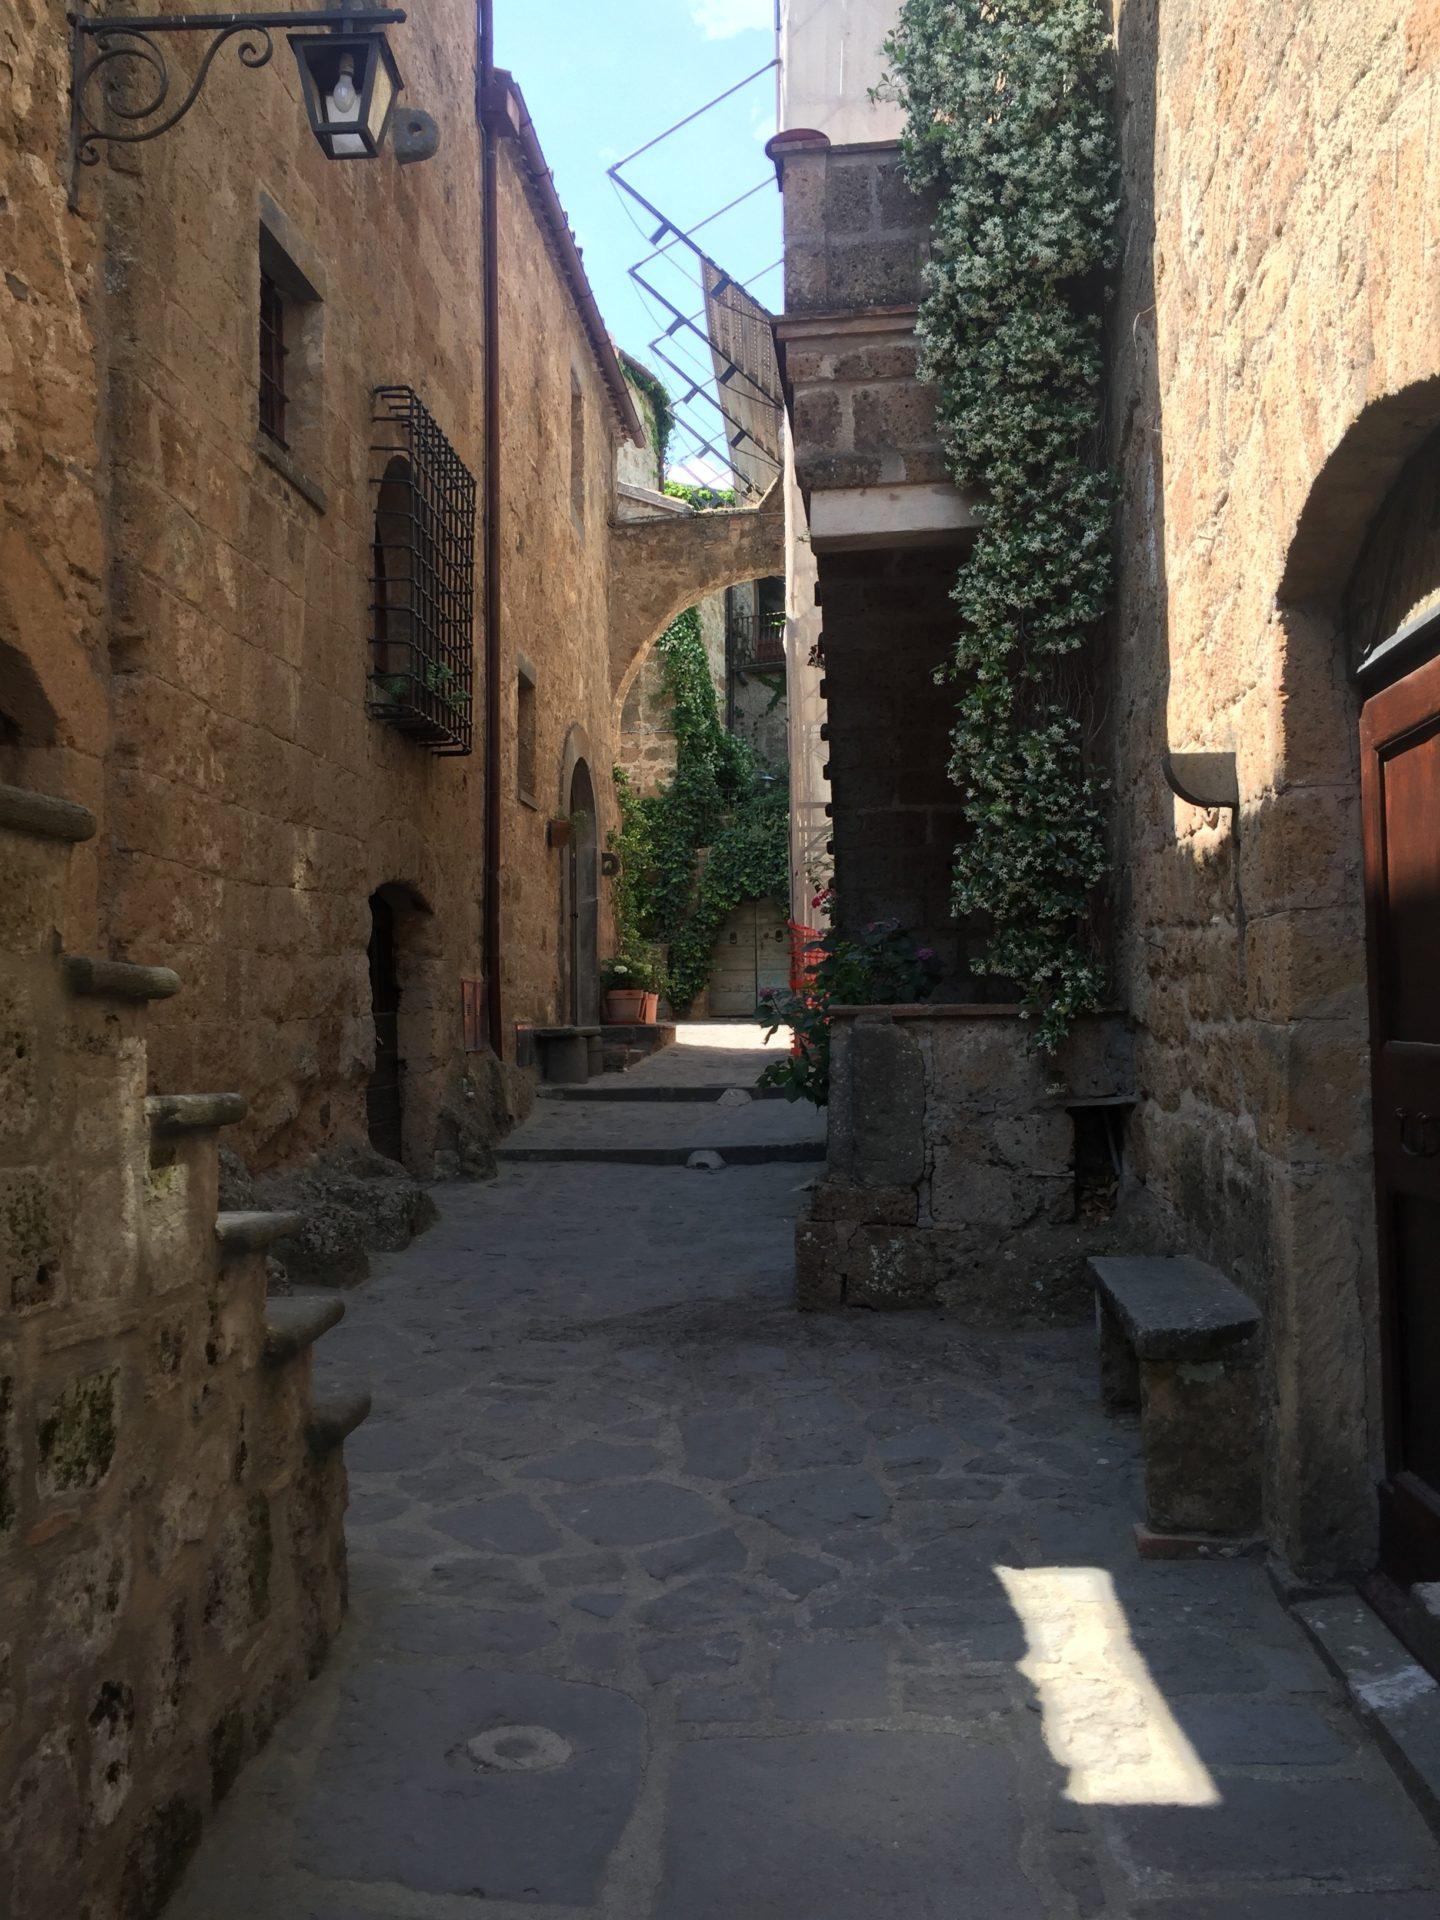 "<img src=""http://marenostrum.pl/wp-content/uploads//2019/09/Bagnoregio-2.jpeg"" alt=""ulica w Civita di Bagnoregio"" />"